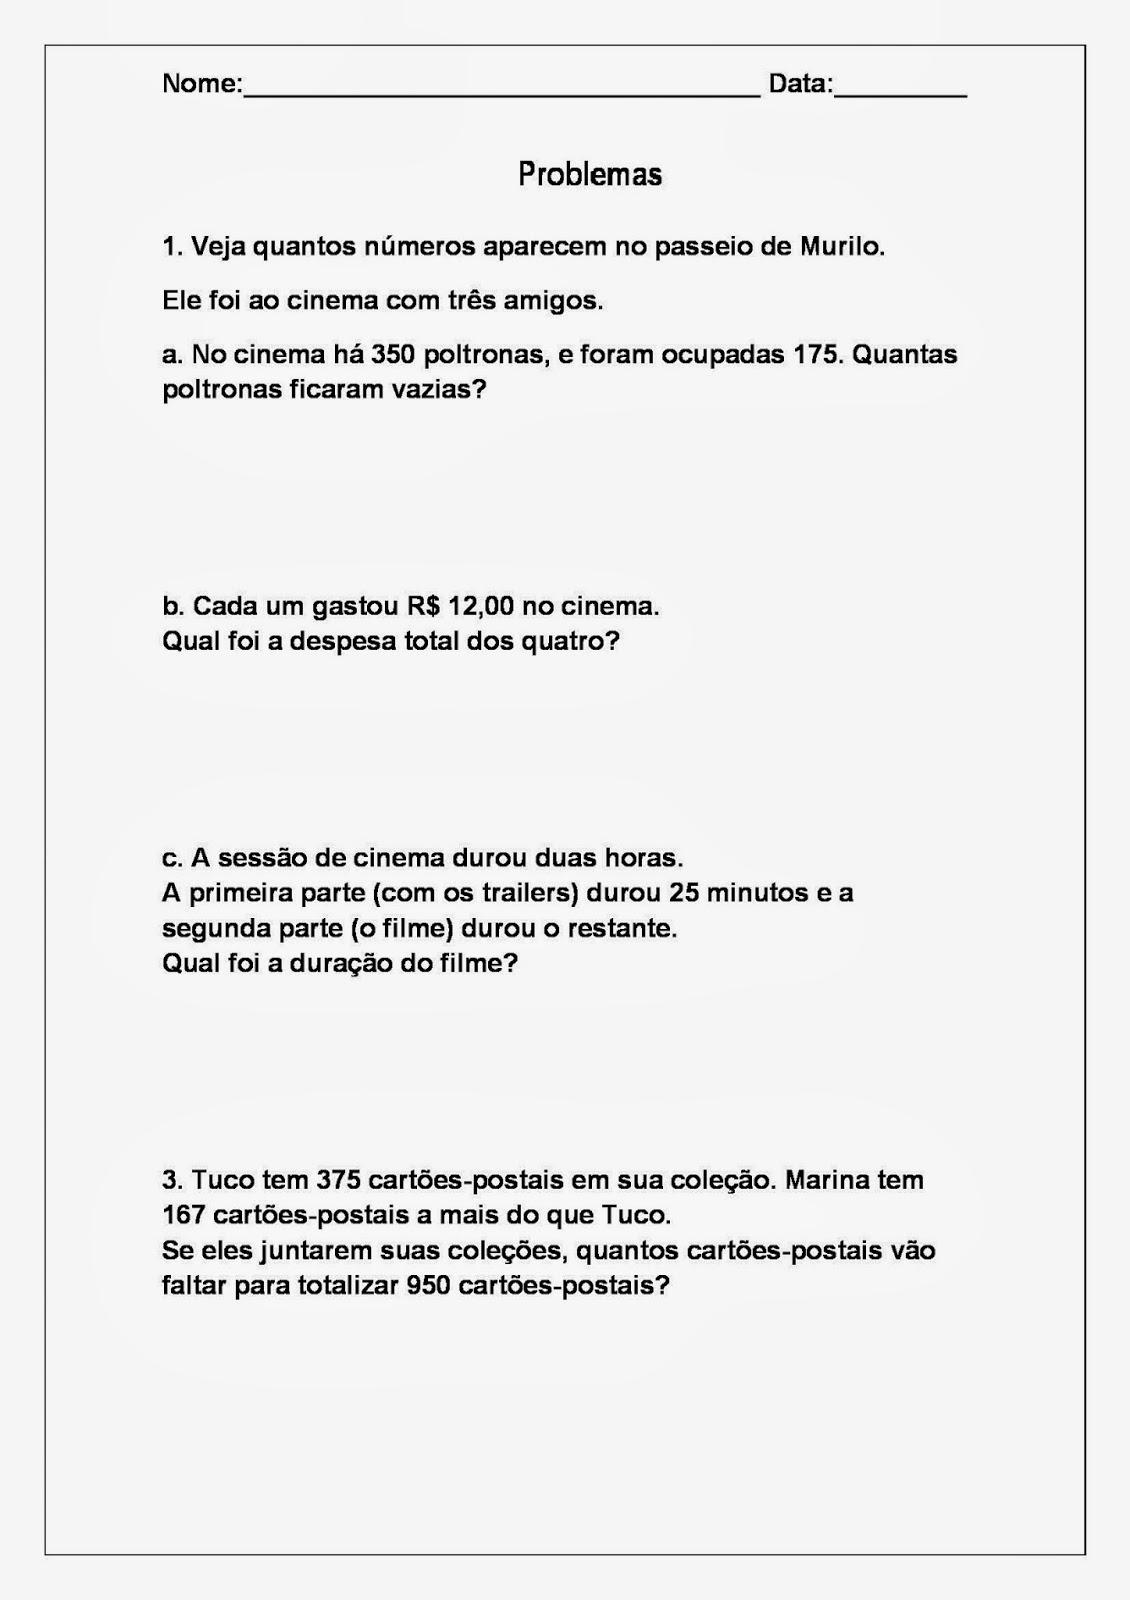 Problemas De Matematica 3 Ano Atividades Educativas Para Imprimir So Escola